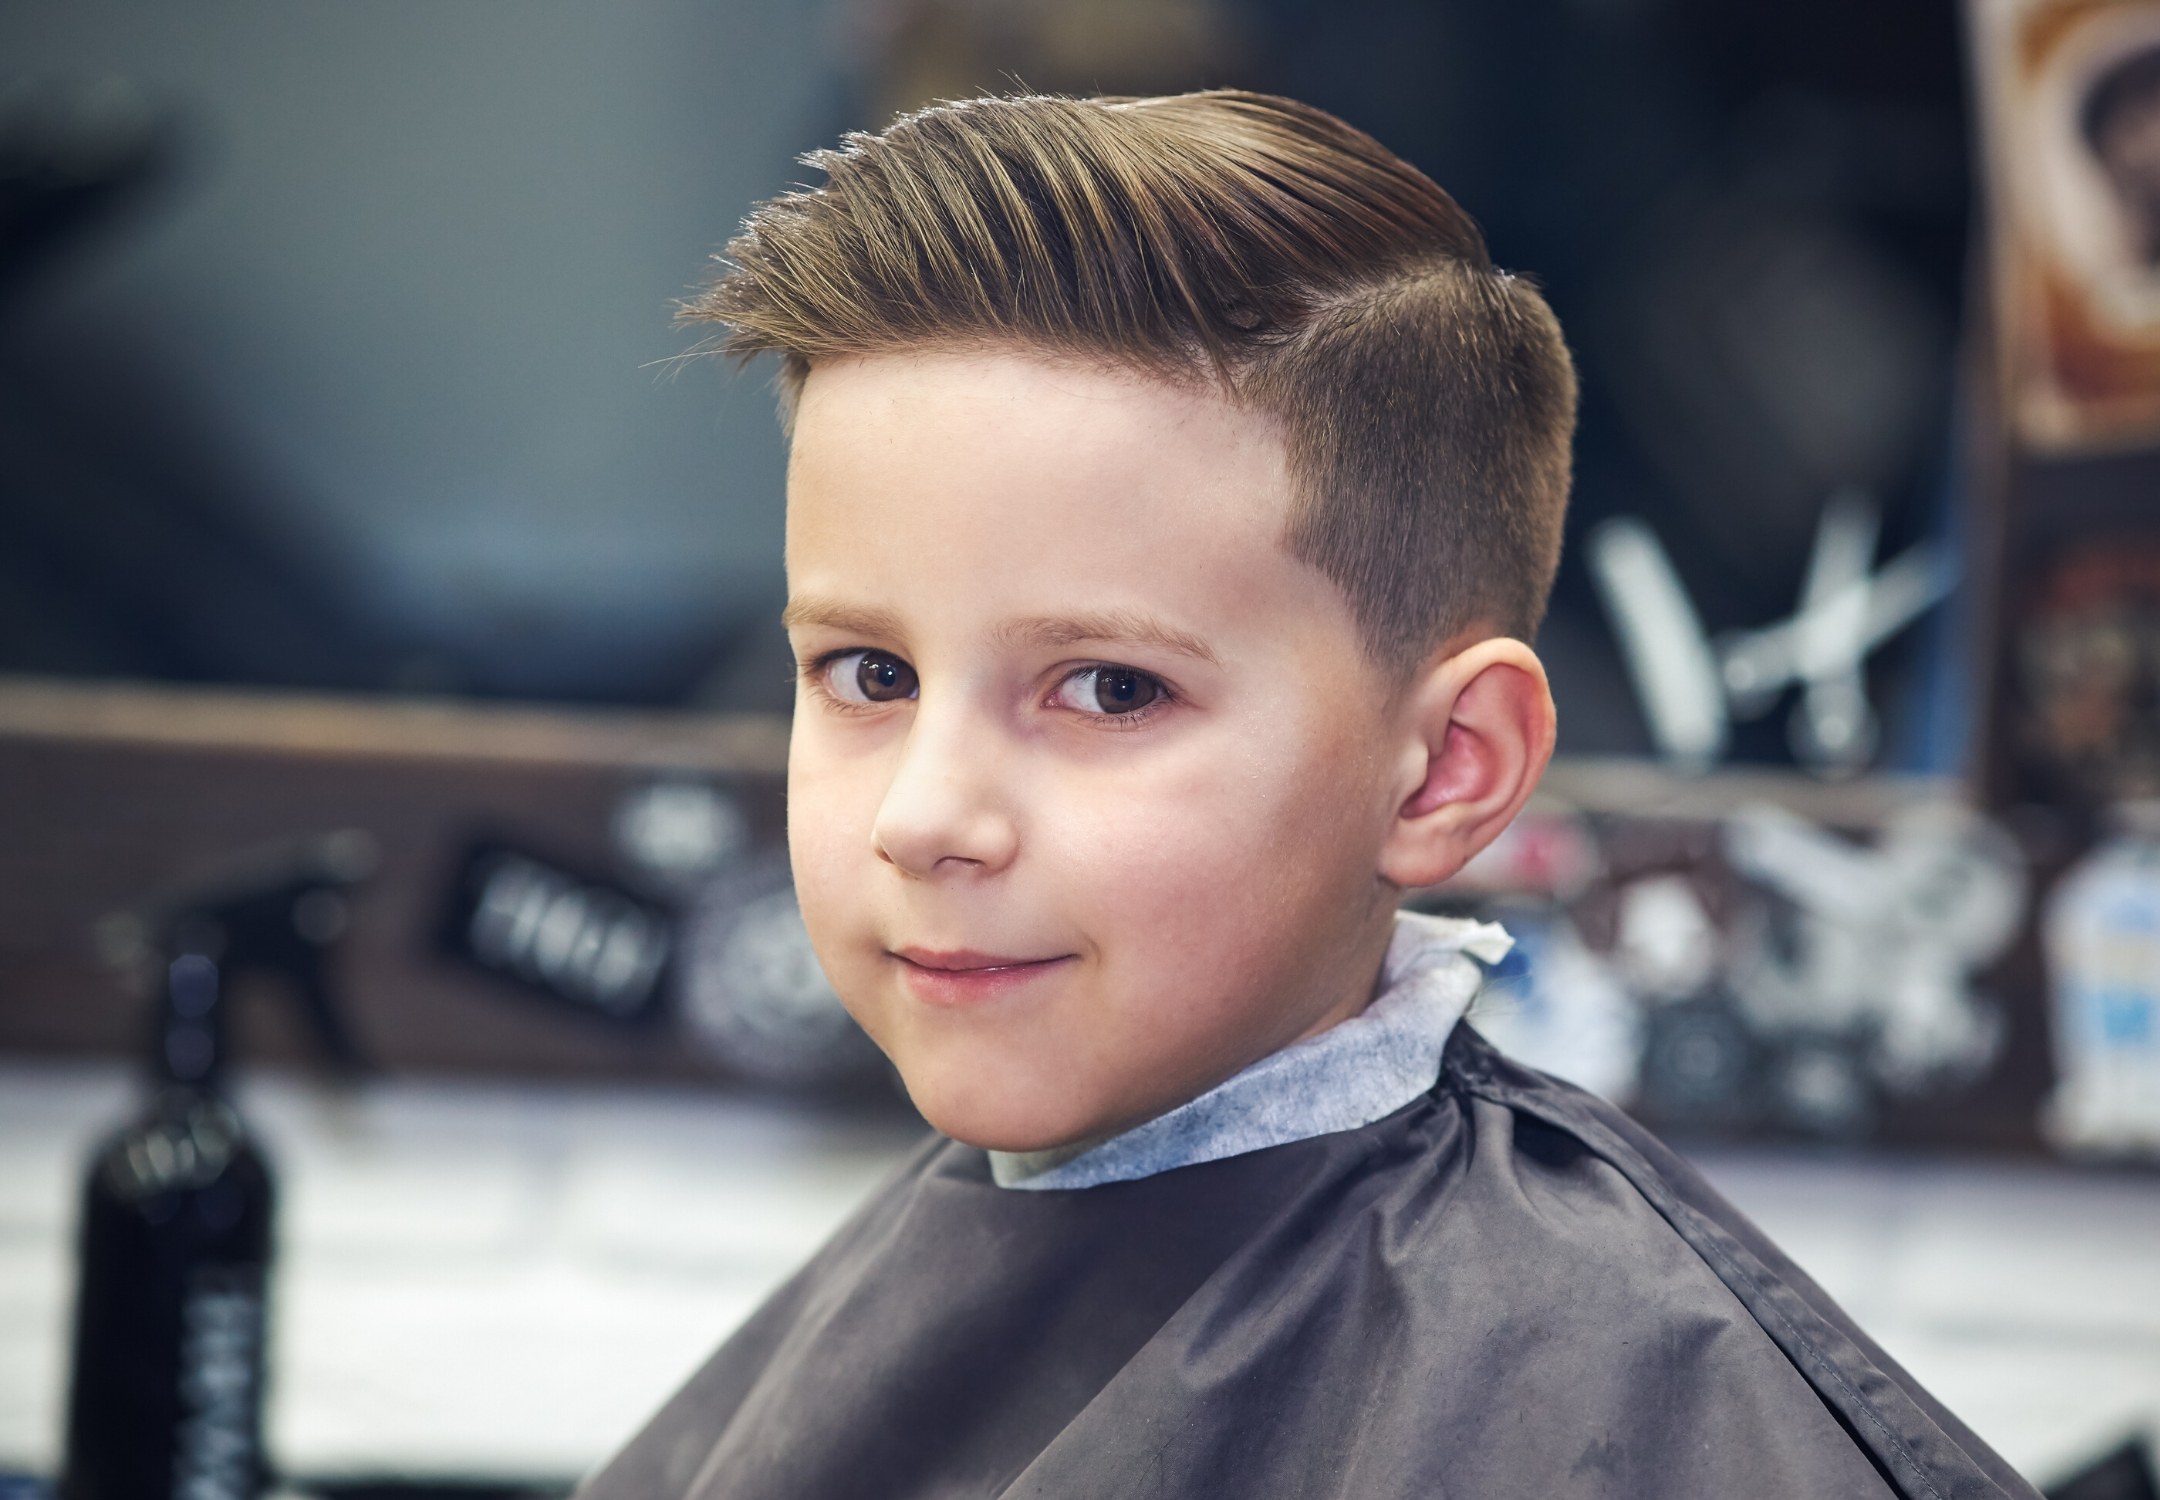 Clean Barber Covid Safe